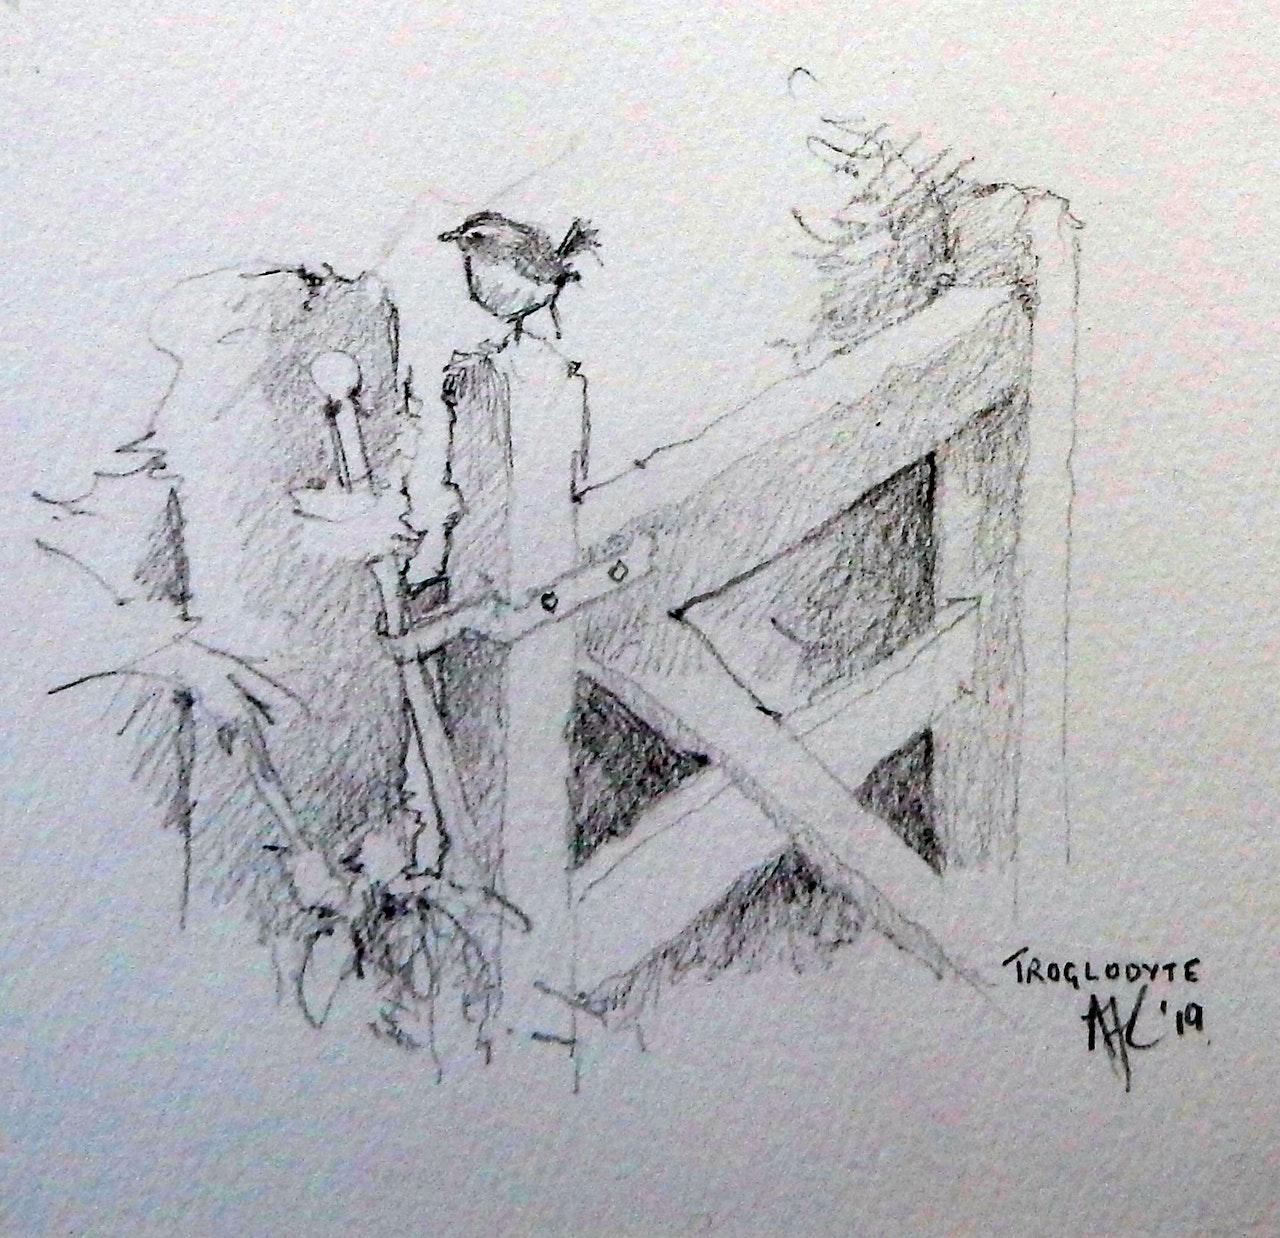 Trog sketch £135 PROCEEDS TO SONGBIRD SURVIVAL